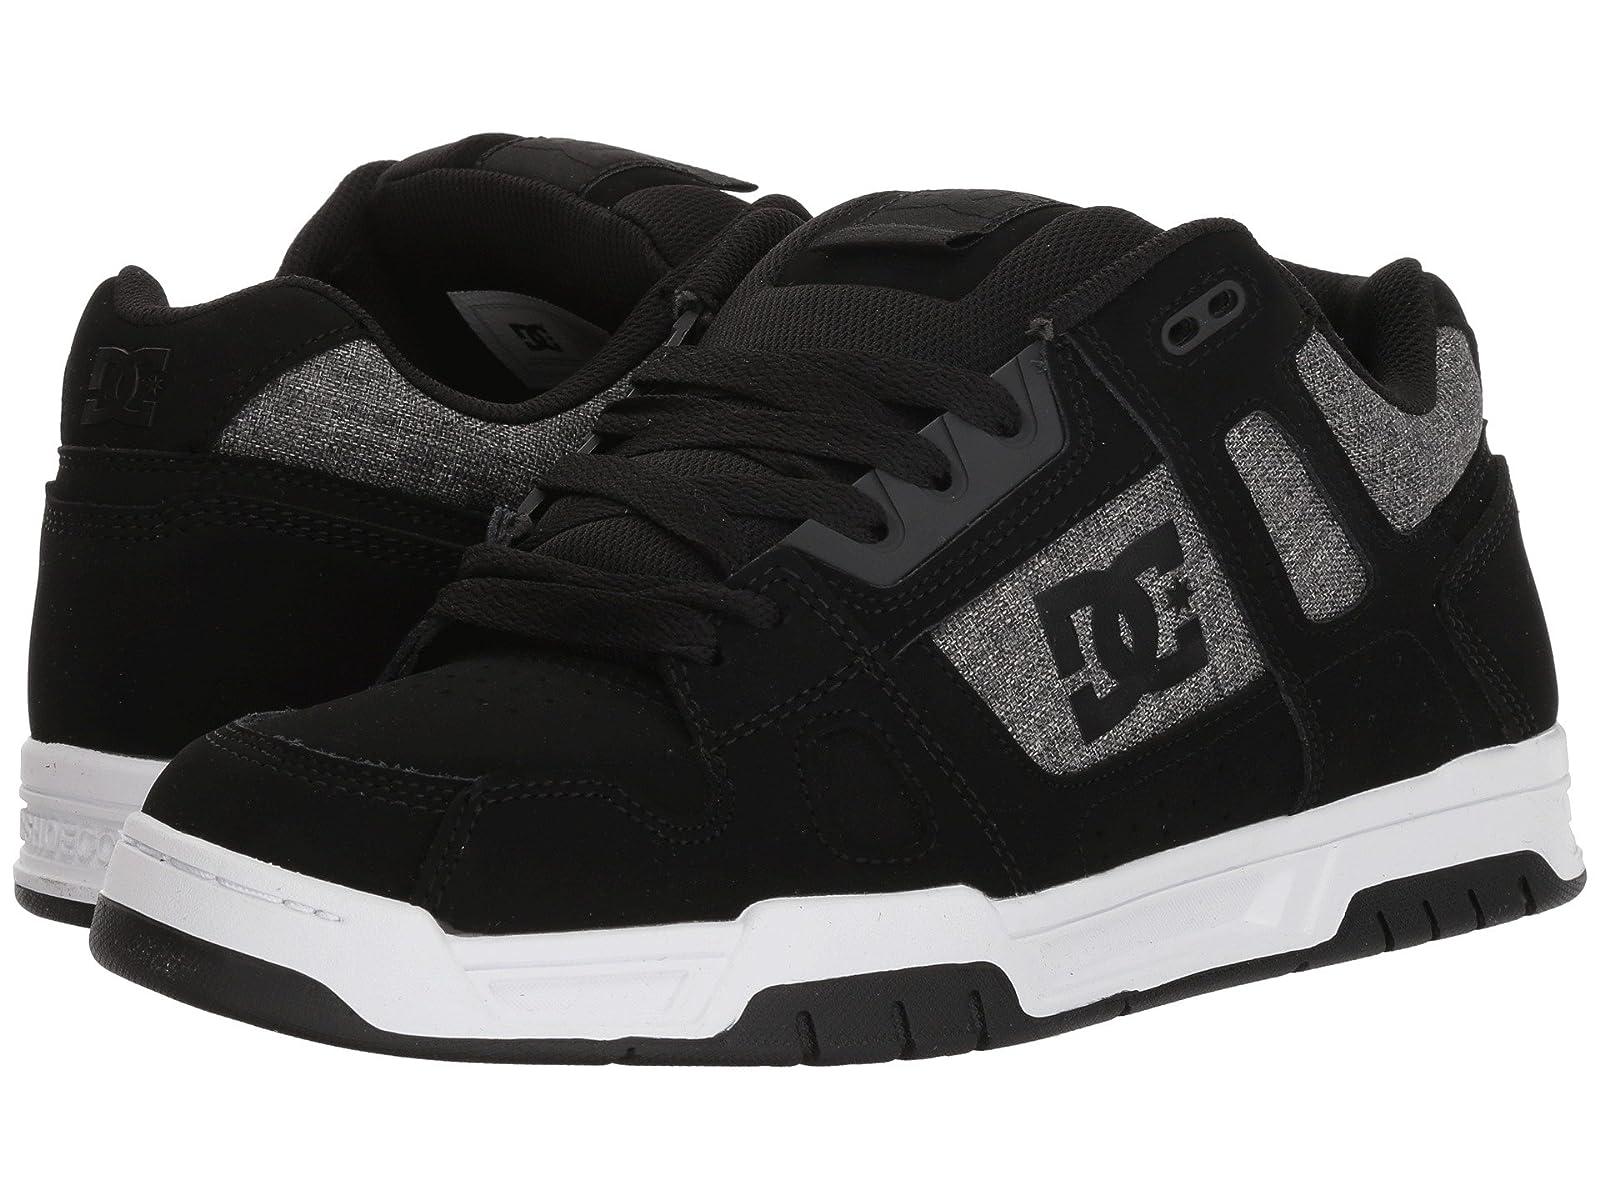 DC StagAtmospheric grades have affordable shoes